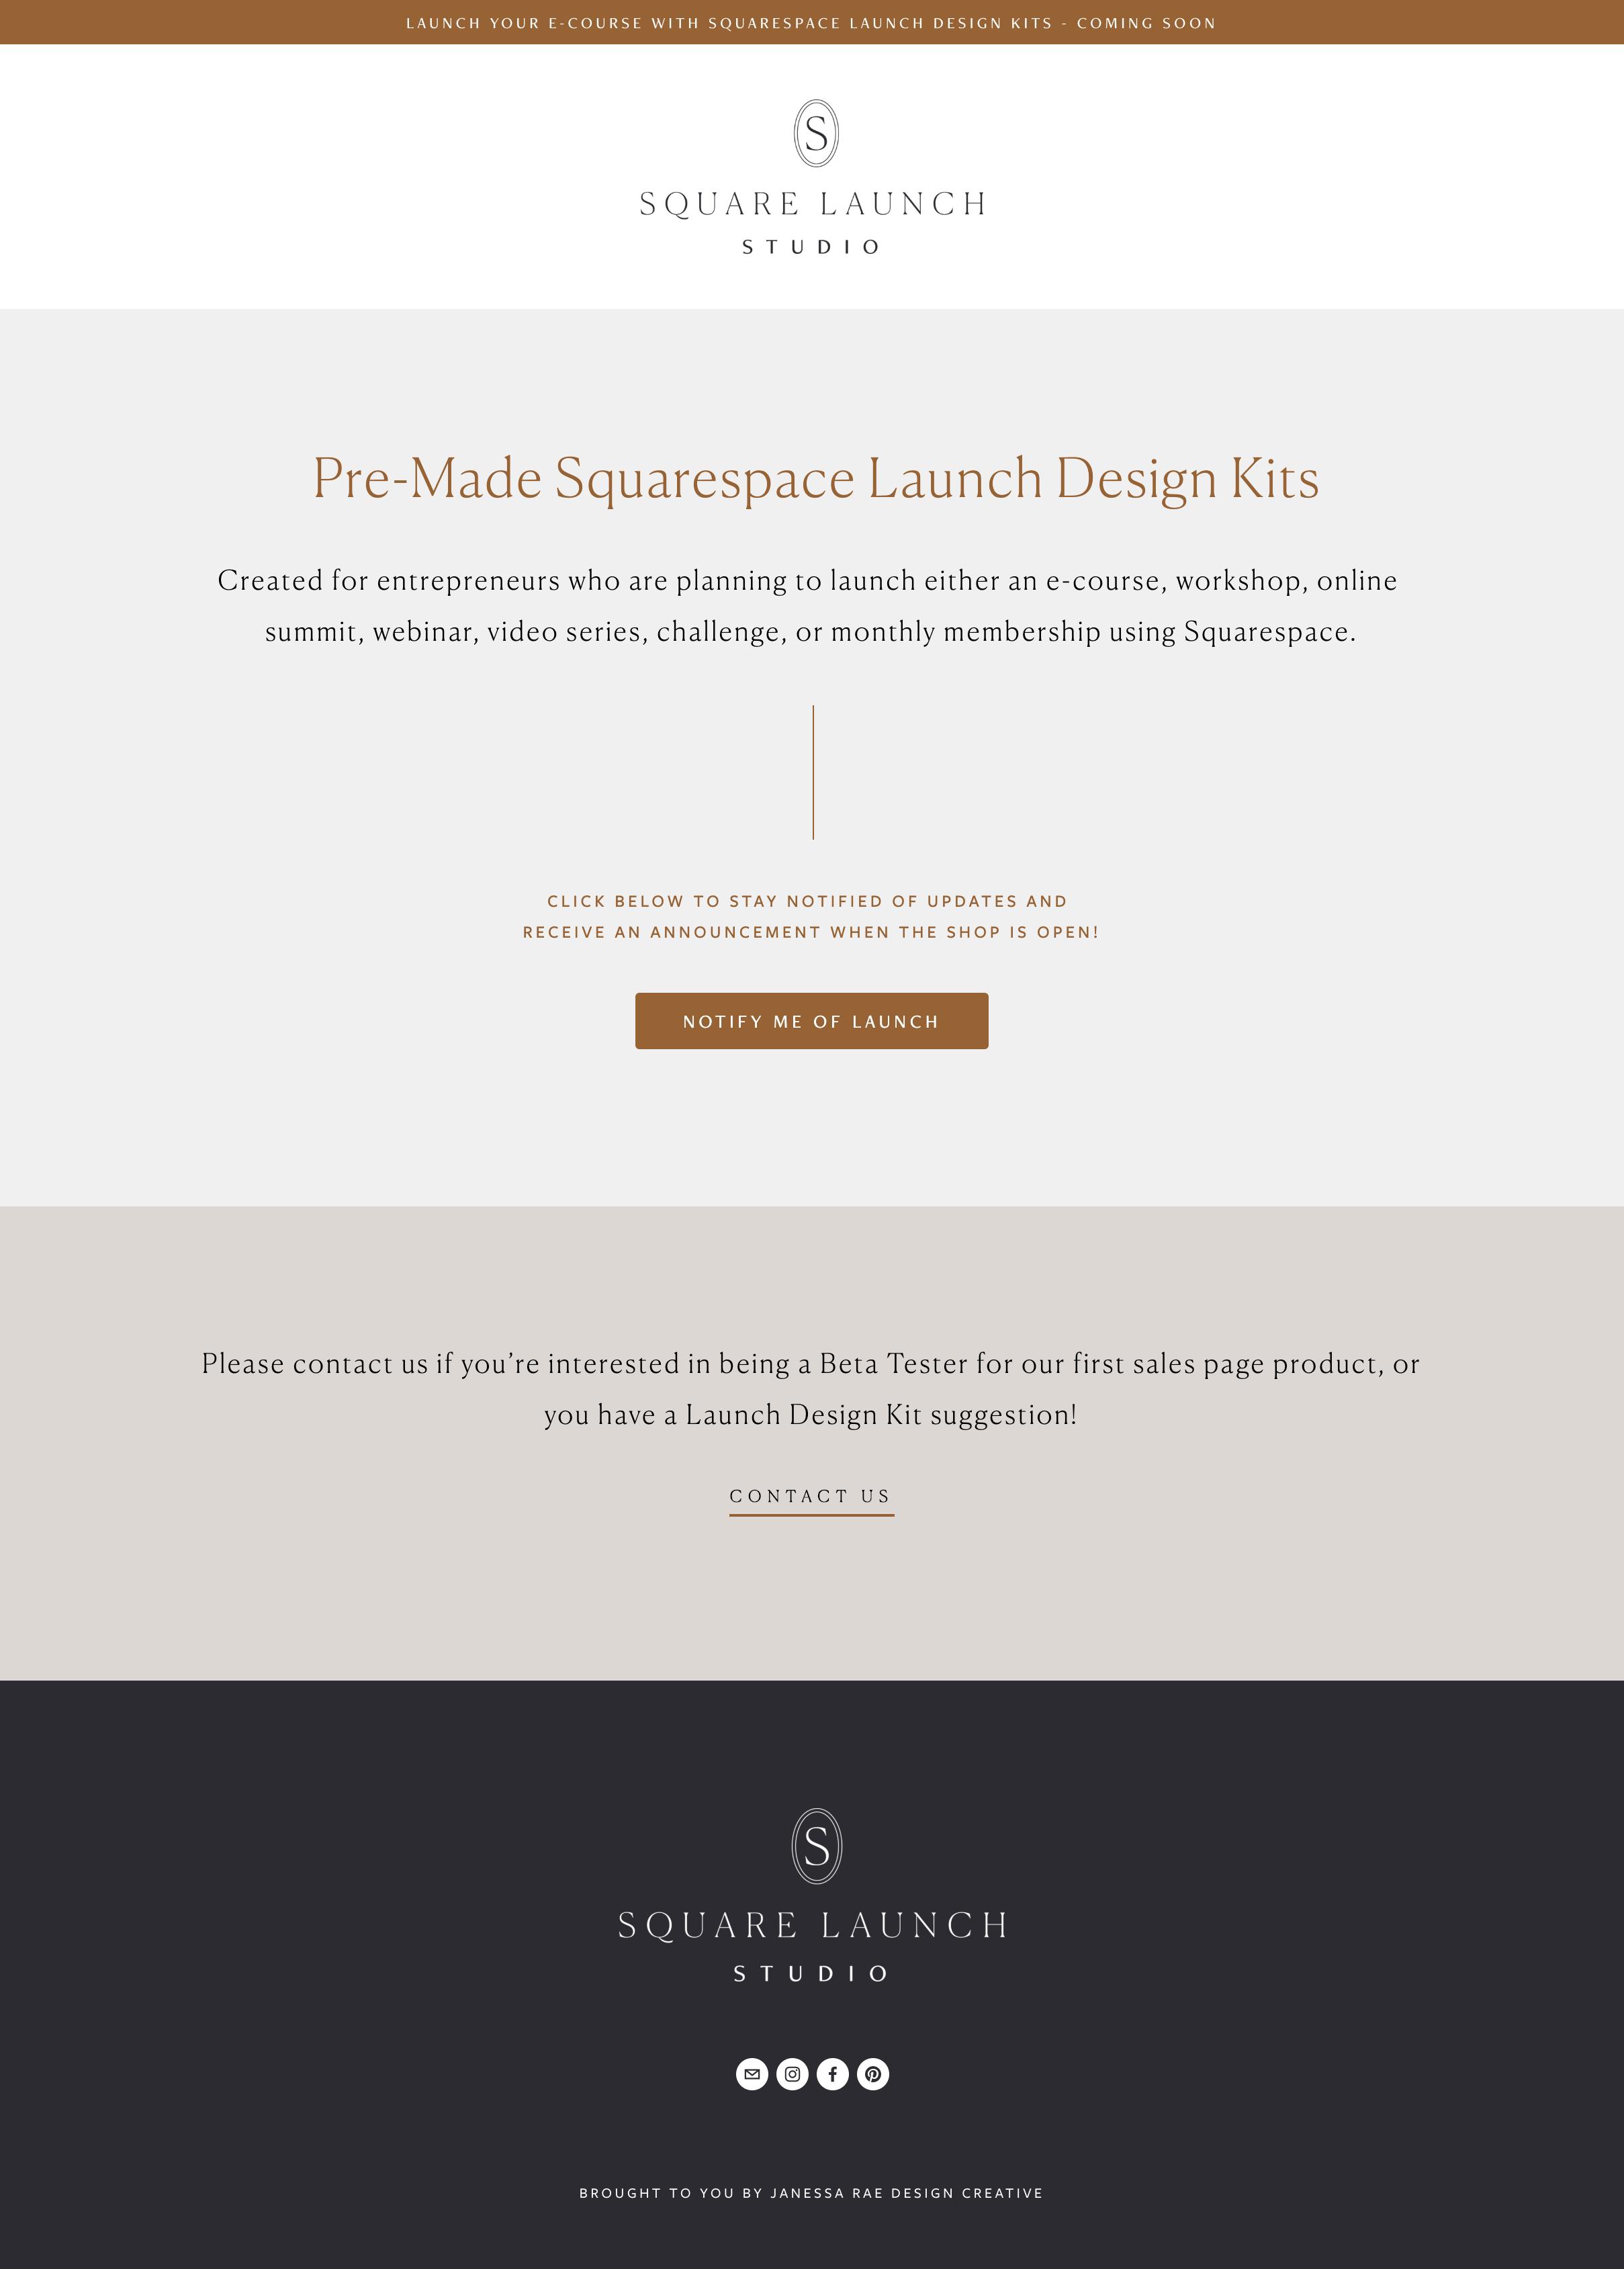 Square Launch Studio — Coming Soon Squarespace Design by Janessa Rae Design Creative